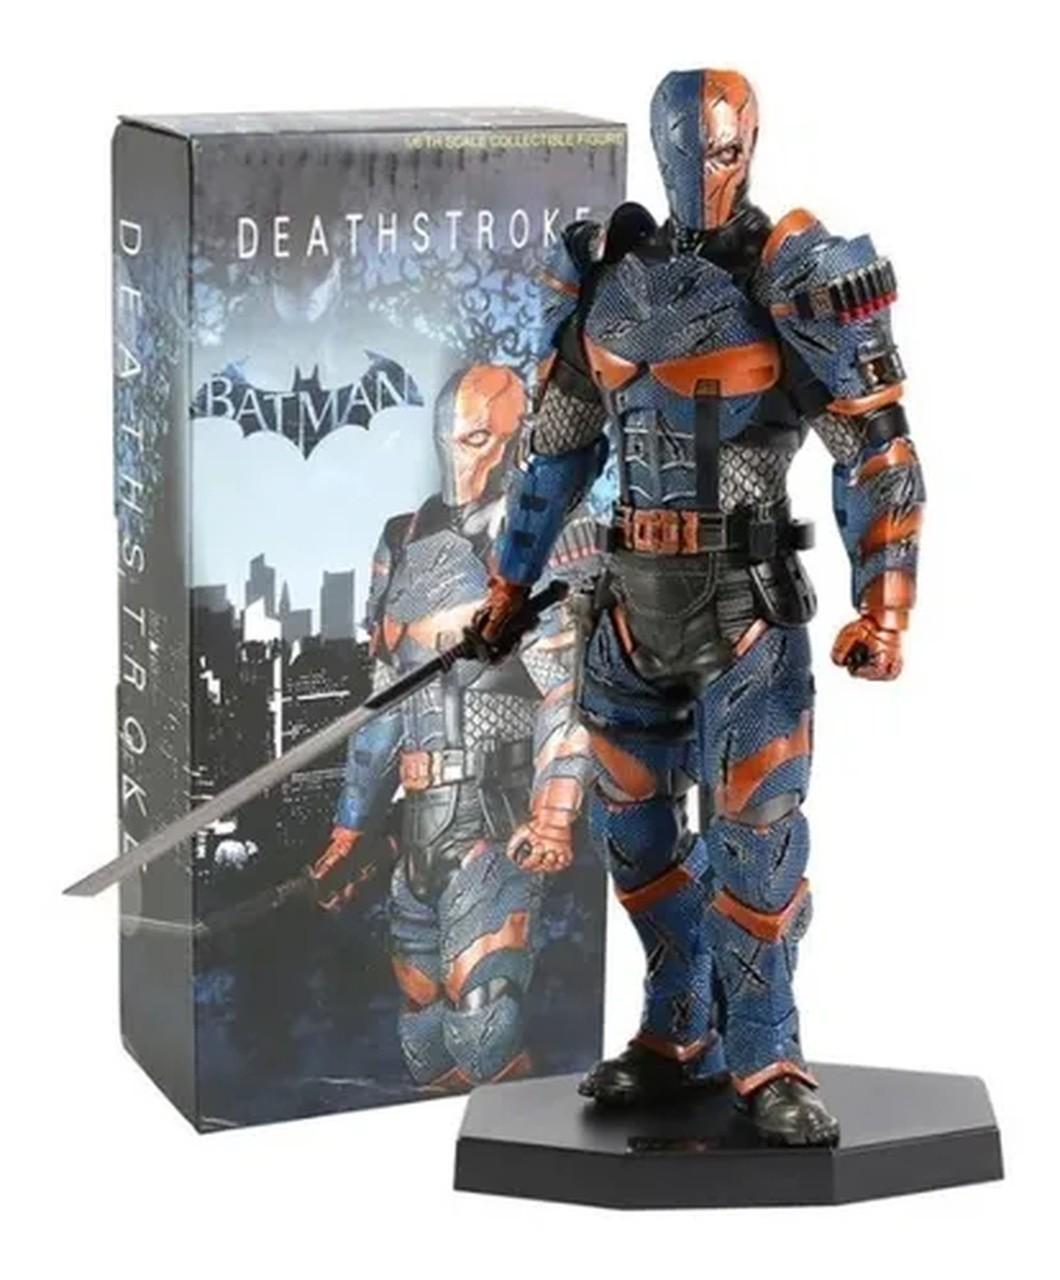 "Estátua ""Exterminador"" (Deathstroke) Batman Arkham Origins: Escala 1/6 - Team Of Prototyping"